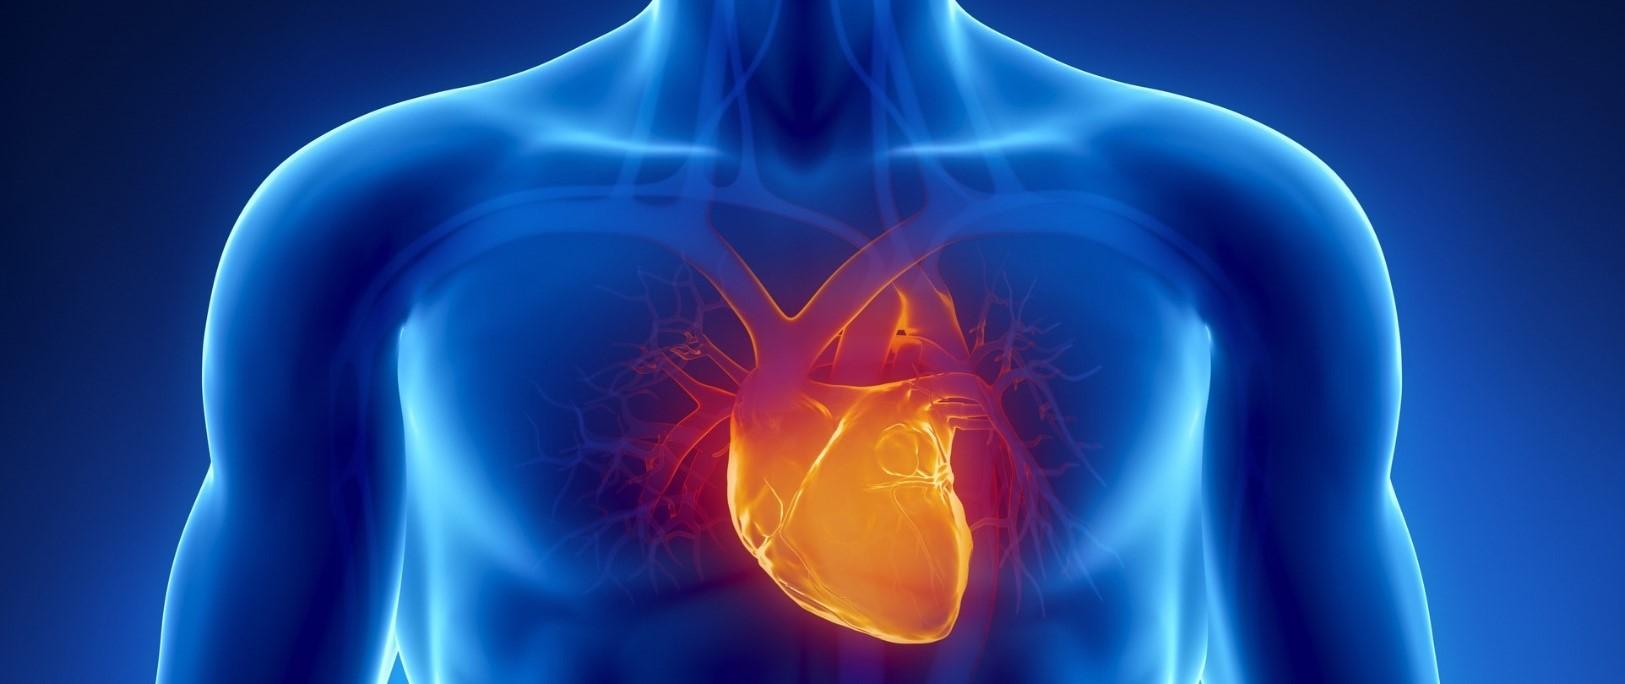 Una gota de sangre para identificar un 'falso infarto'...